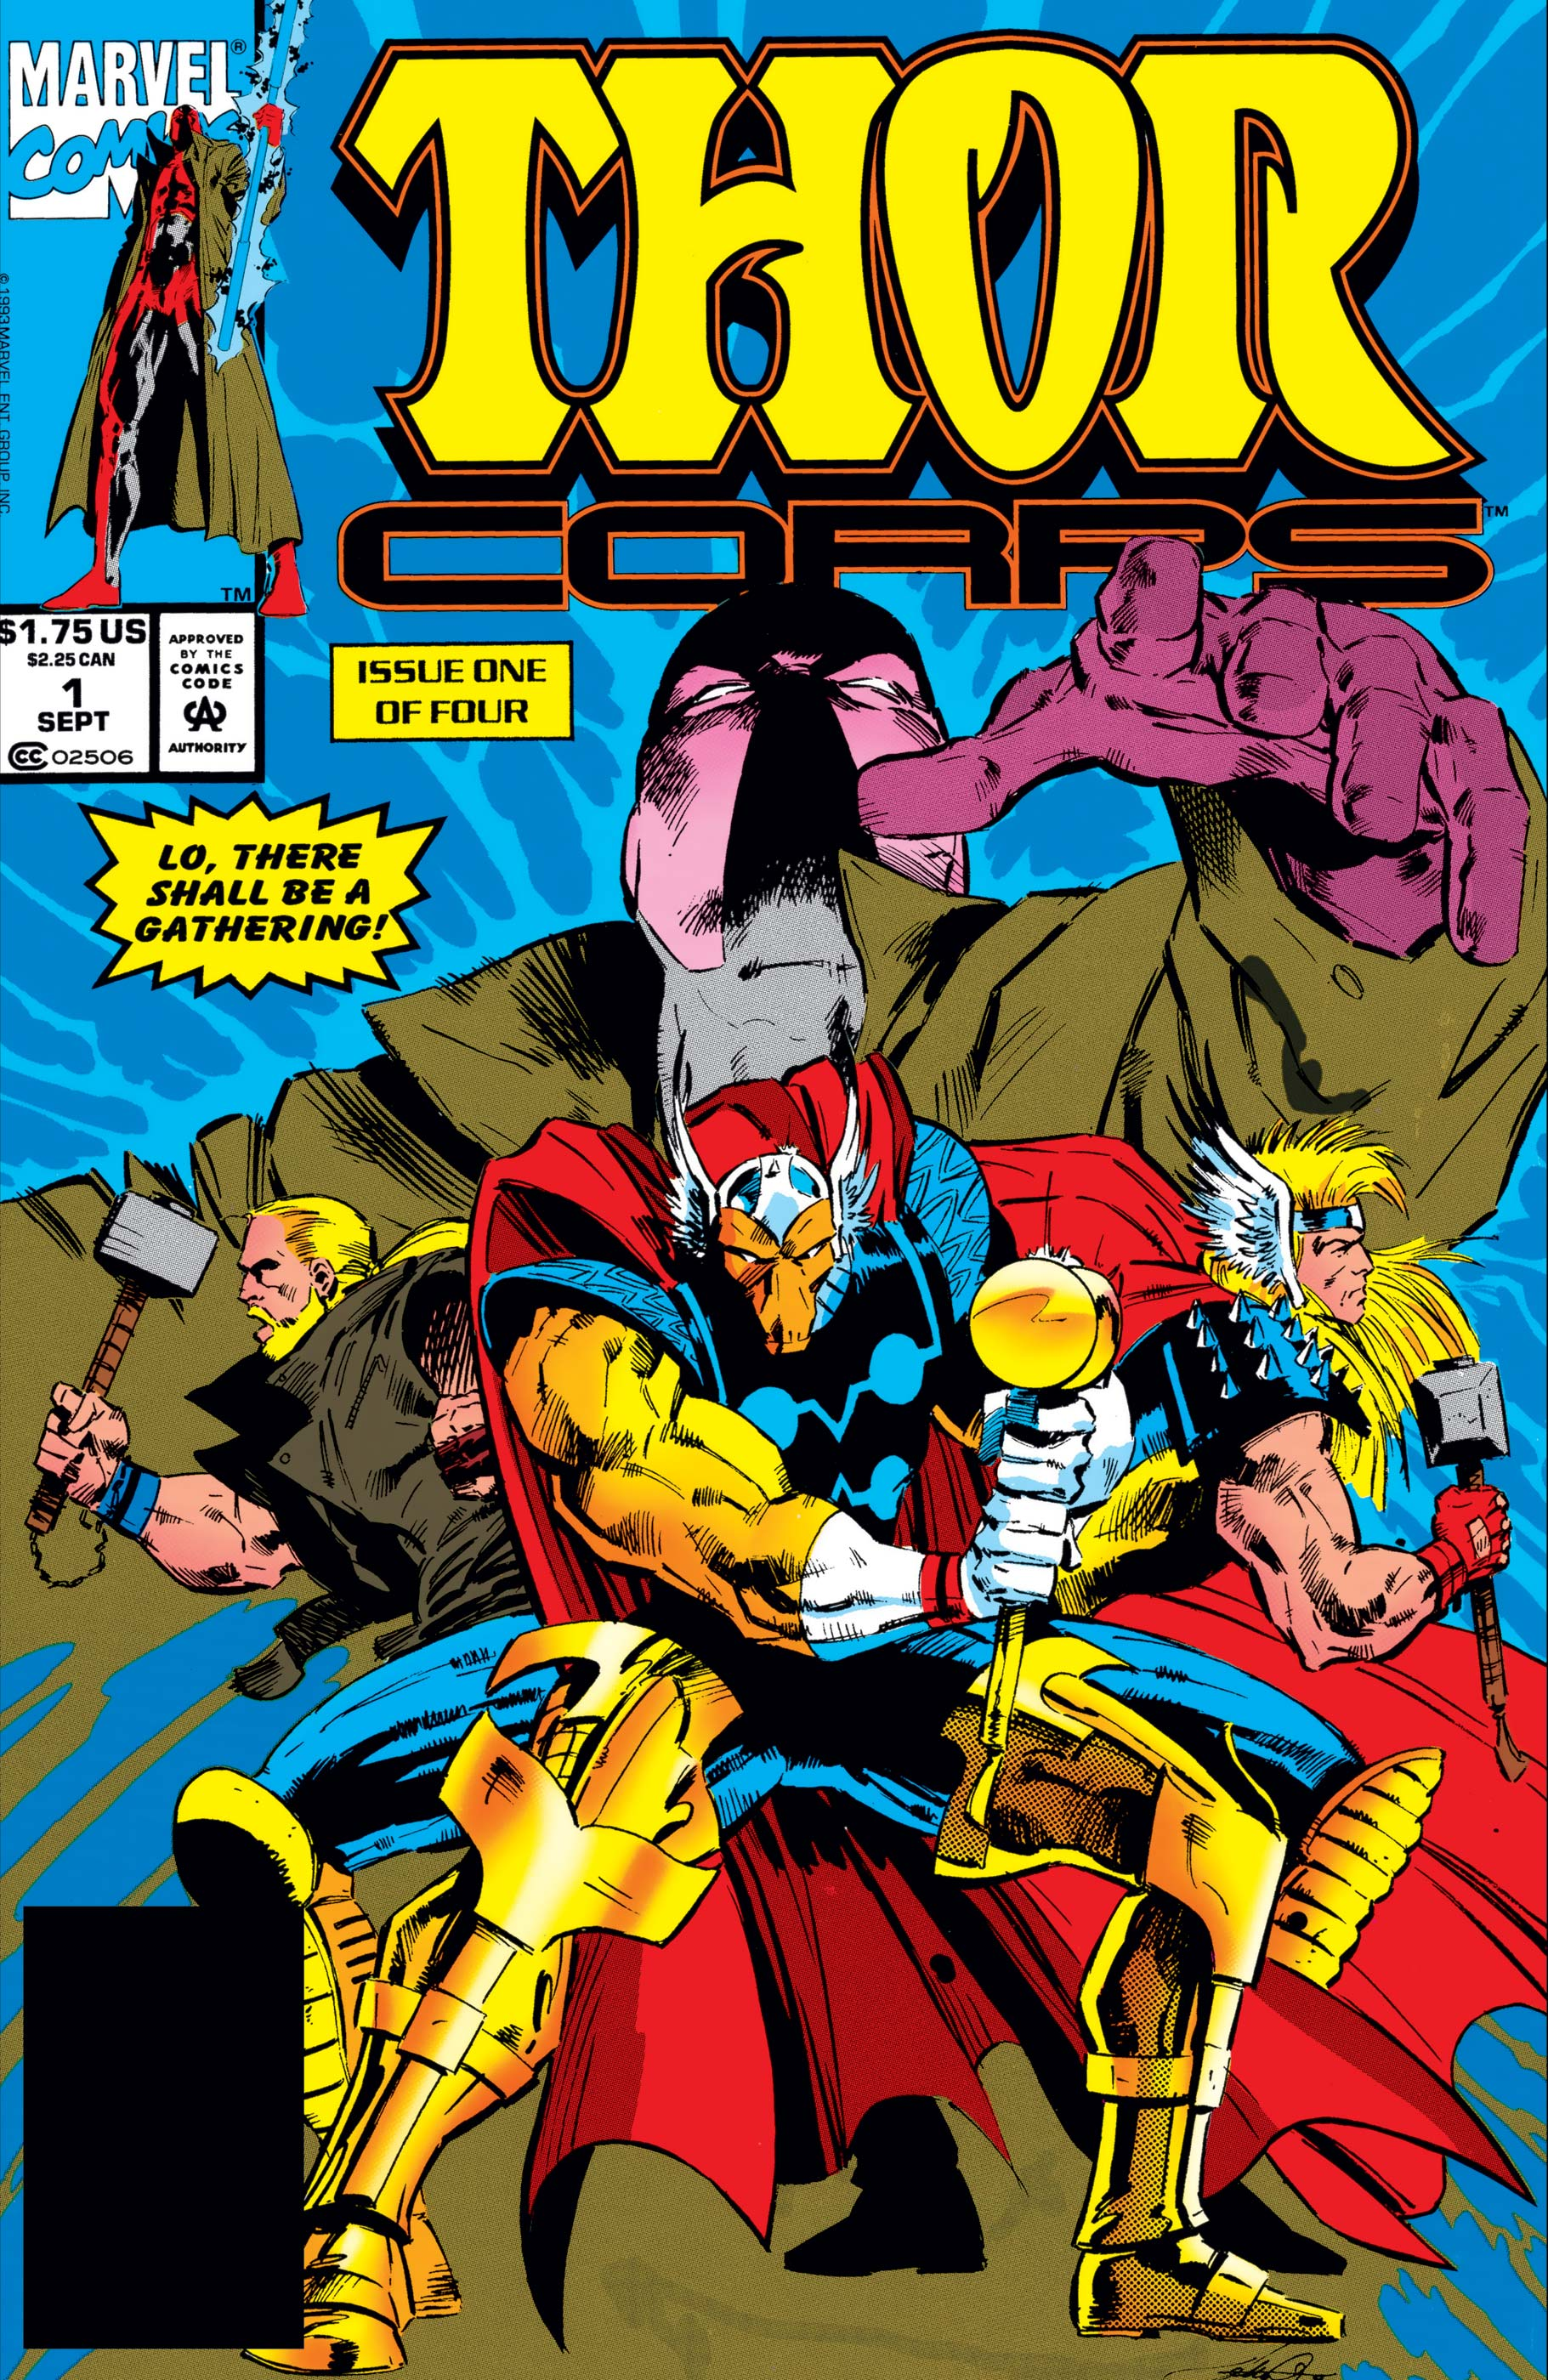 Thor Corps (1993) #1